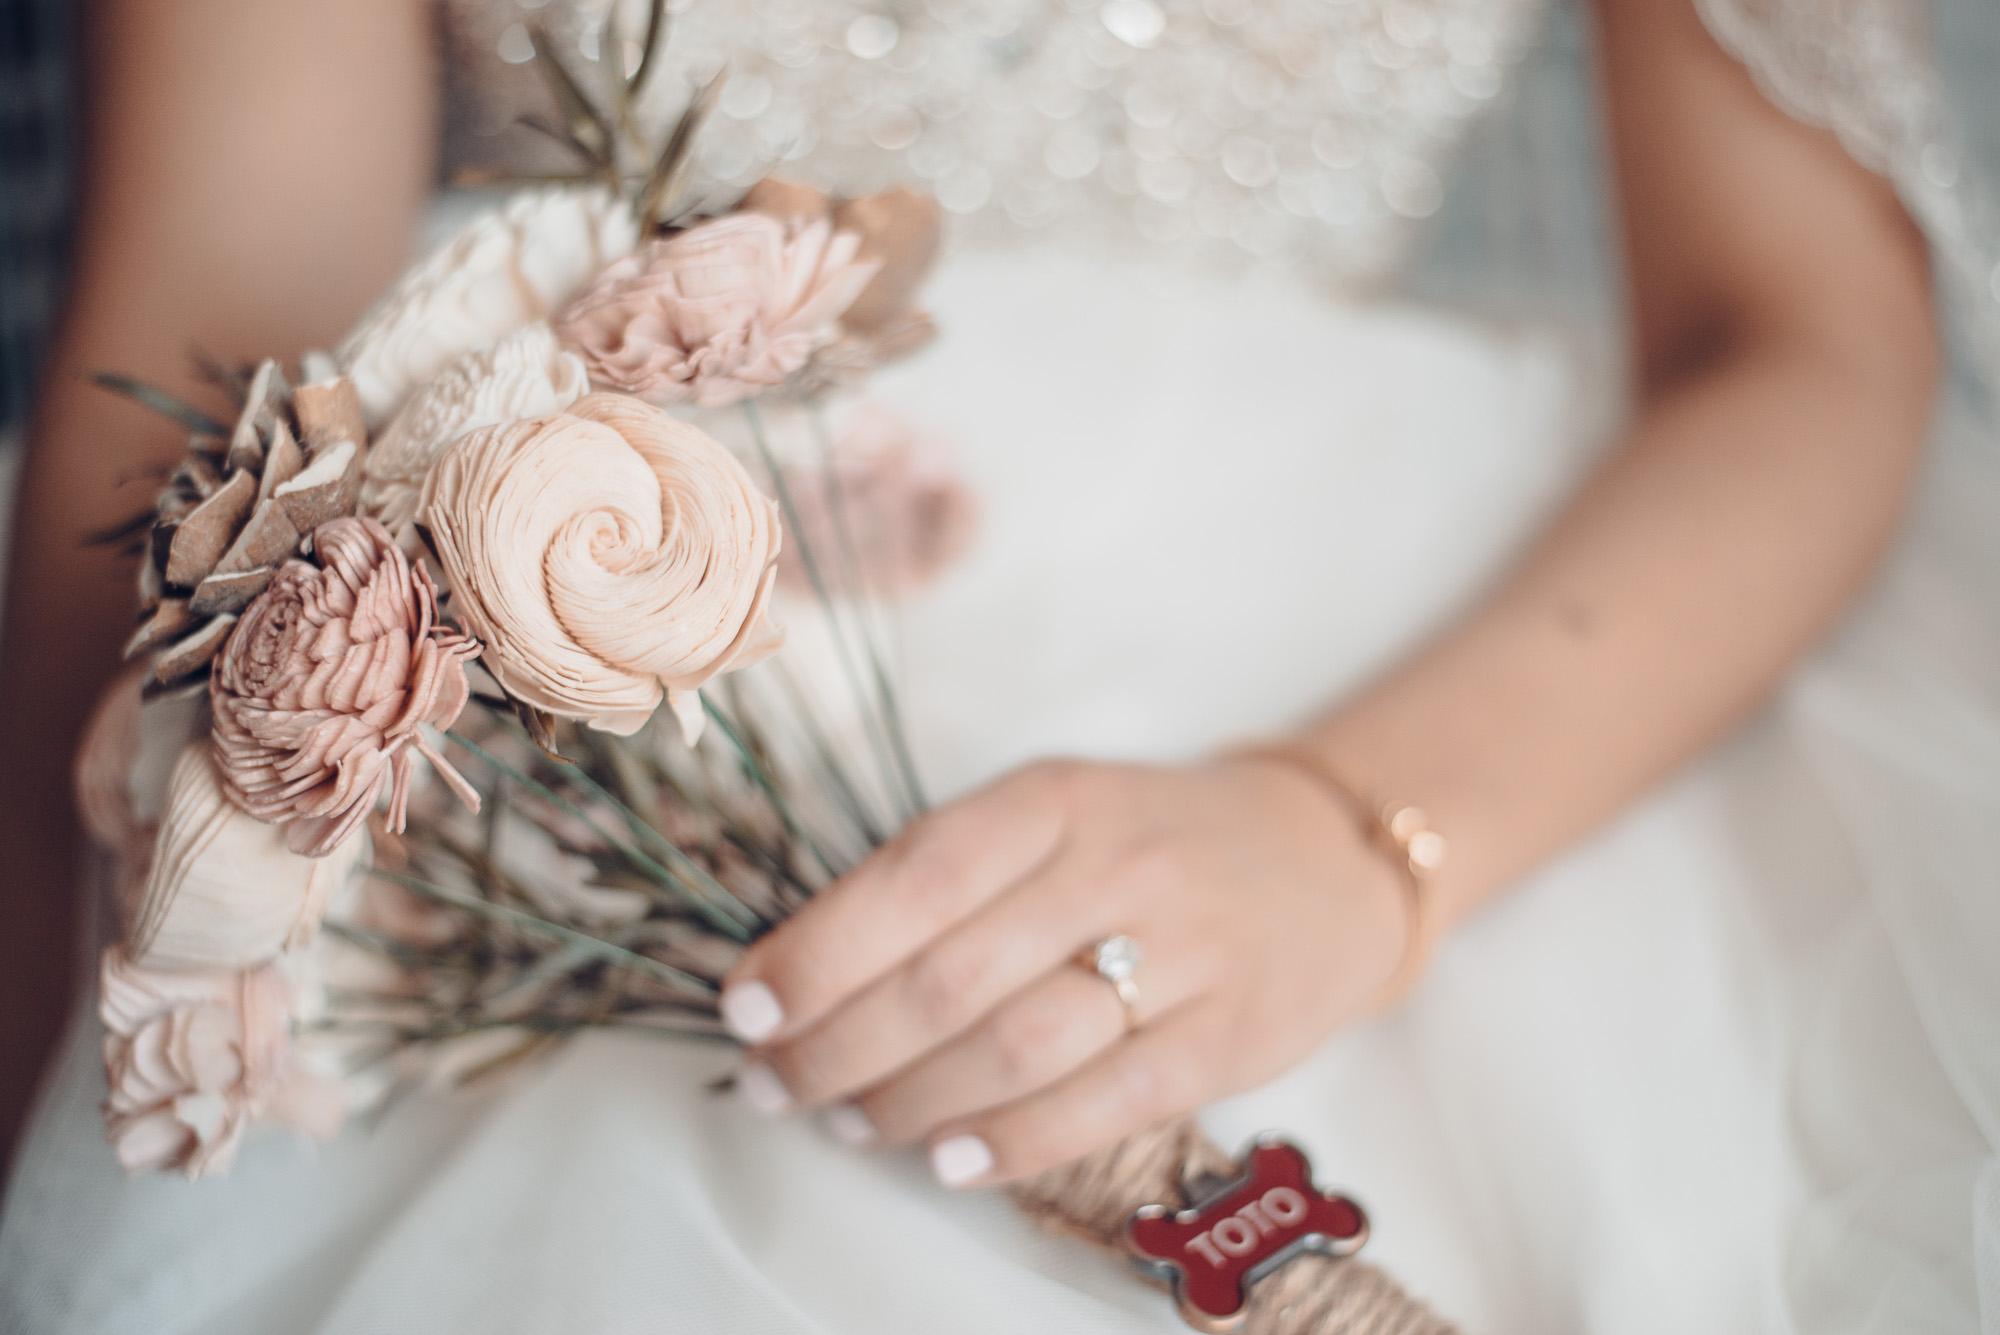 woodwinds_wedding_171020_web-19.jpg